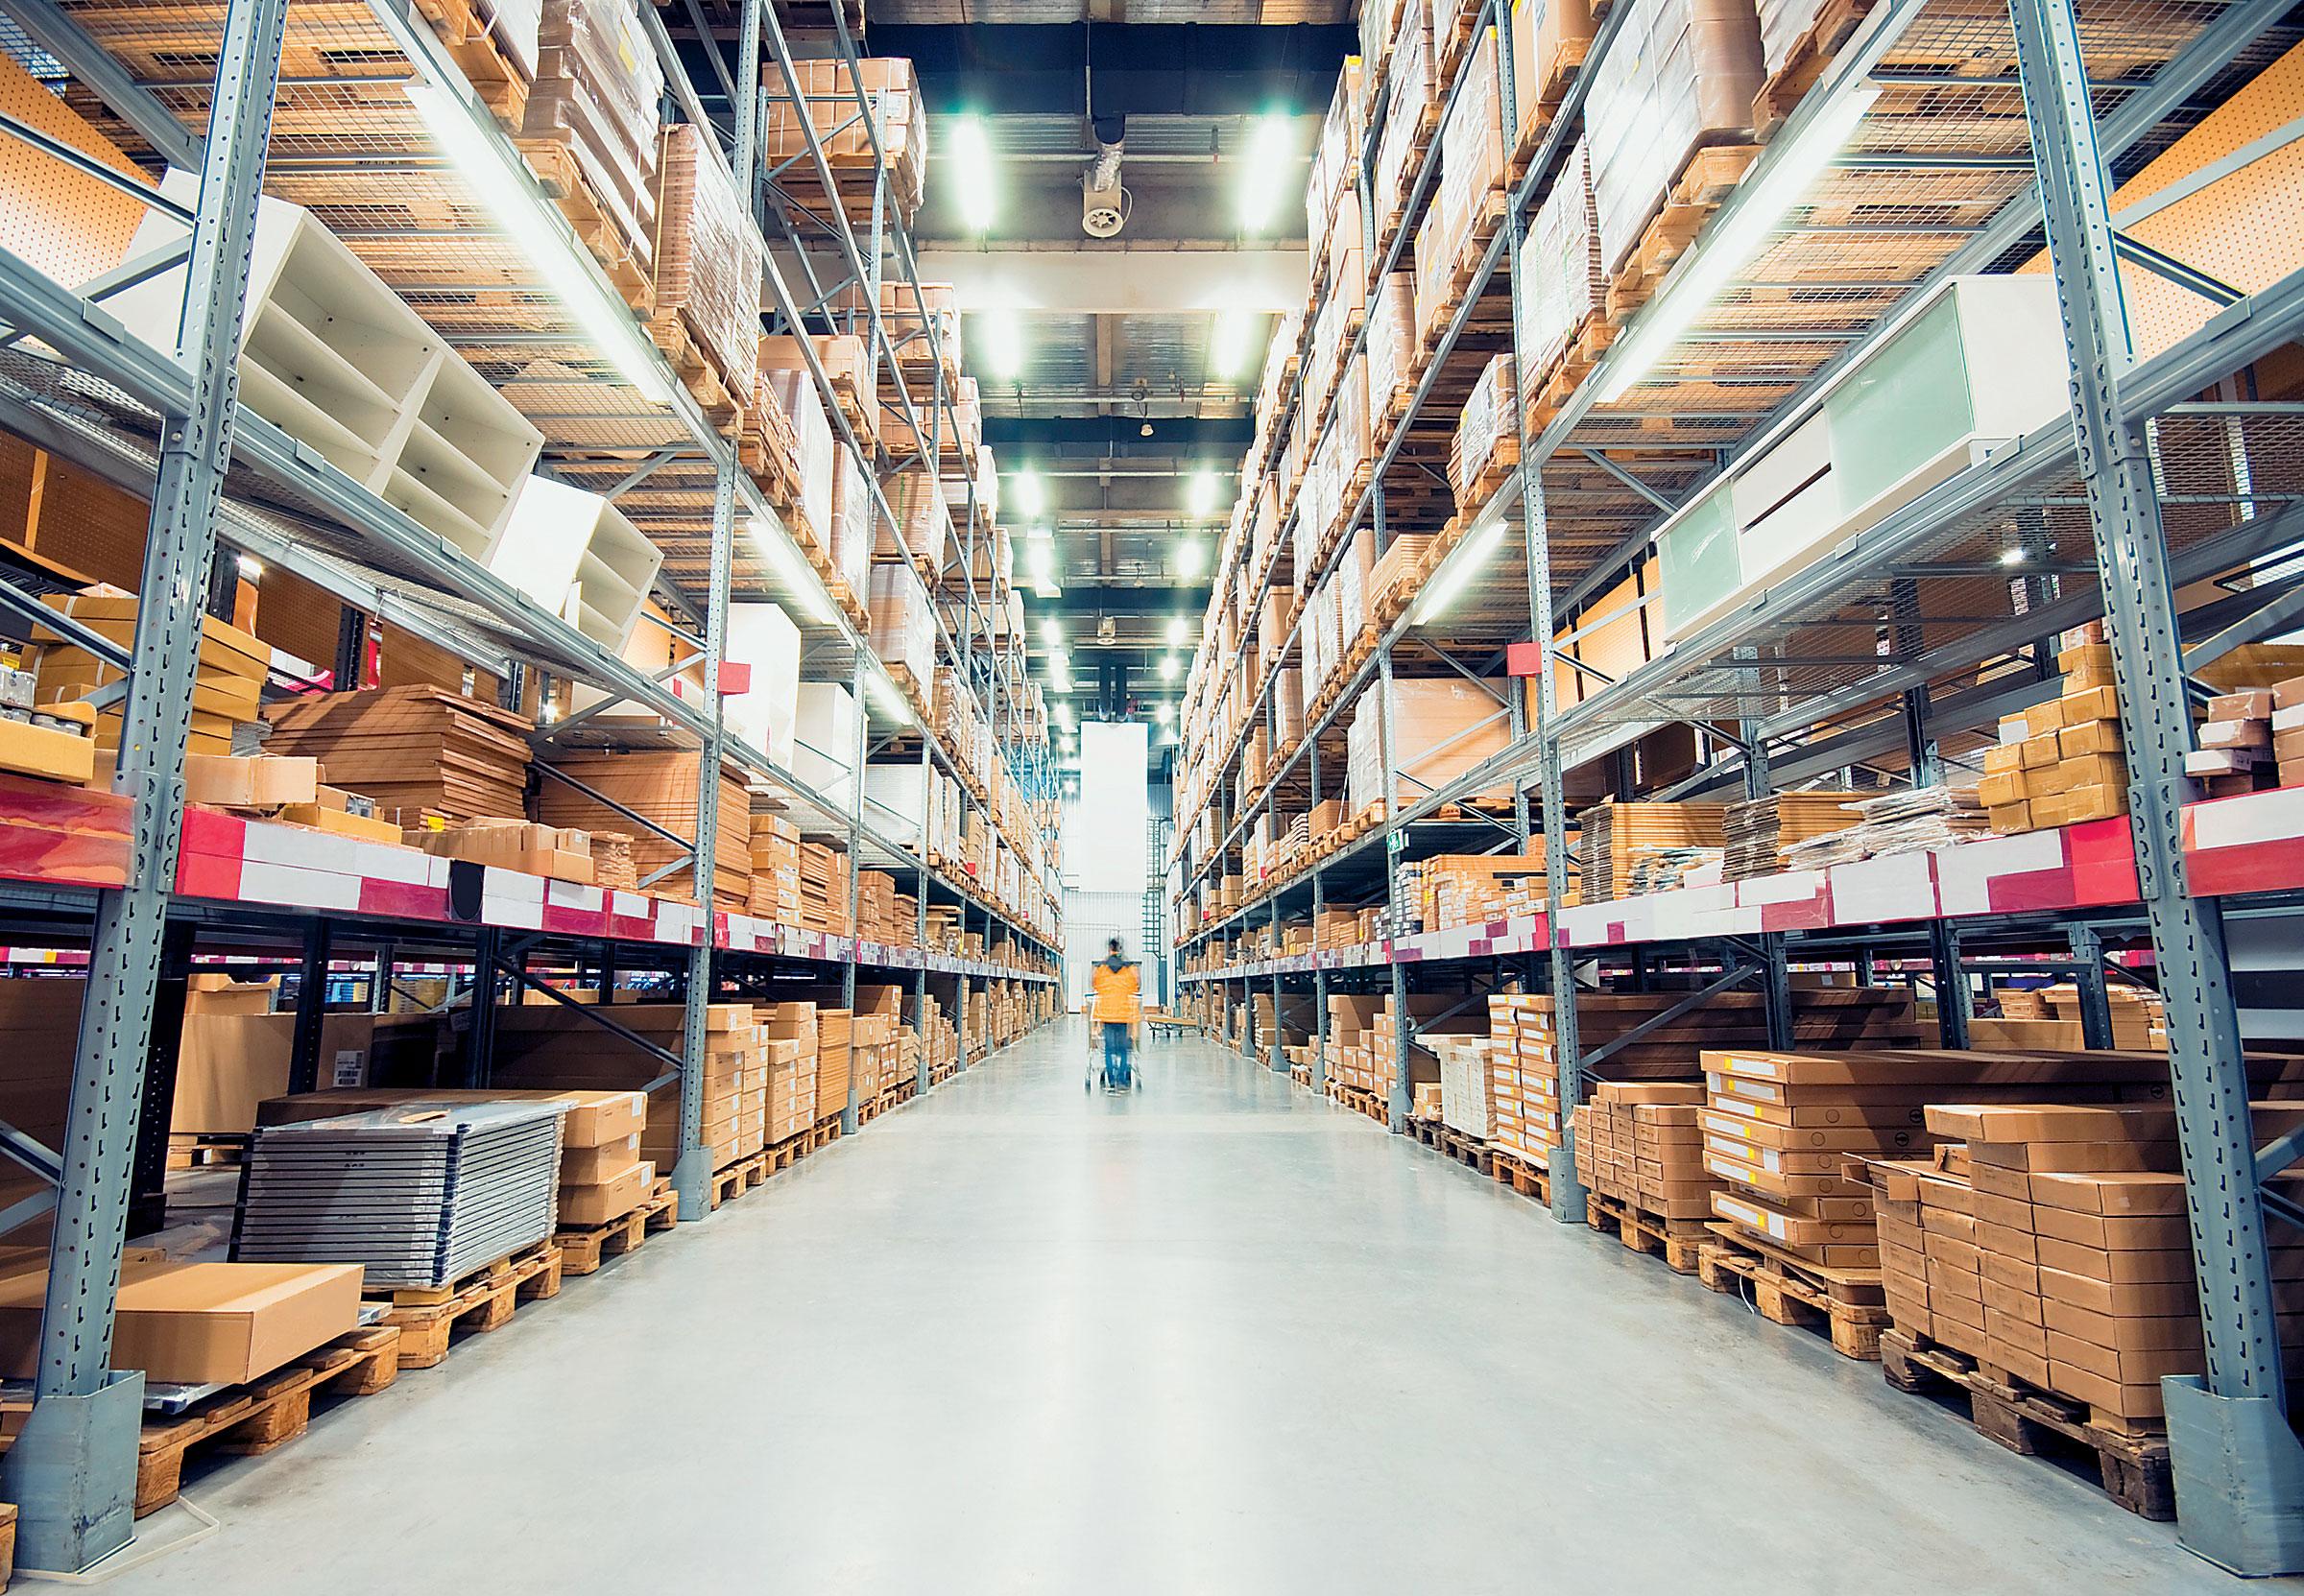 ICAP: Προβληματίζει η βιομηχανία, ελπίδες από το εμπόριο